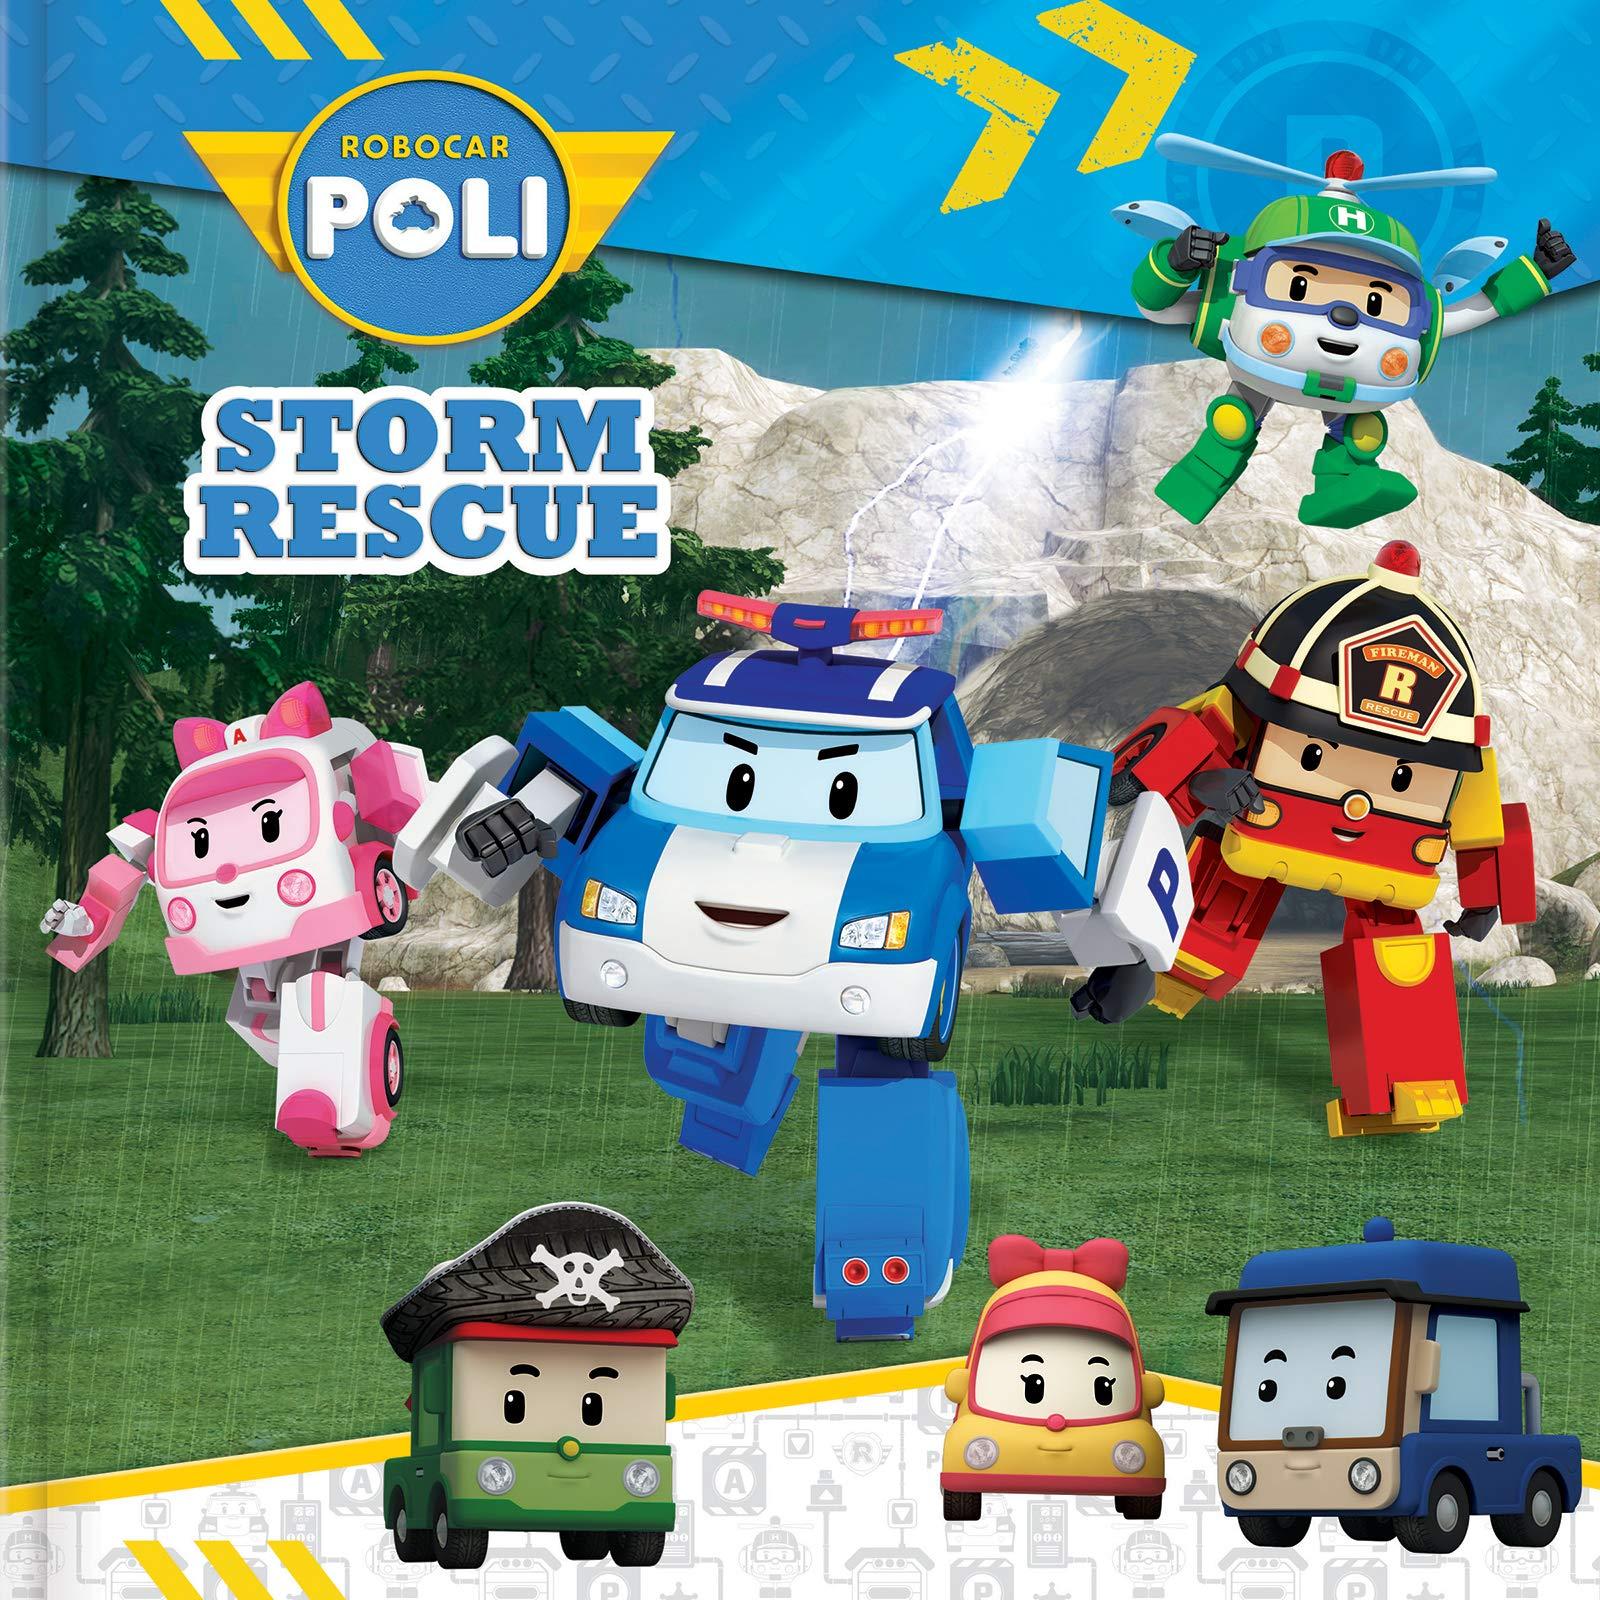 Robocar poli storm rescue paperback march 12 2019